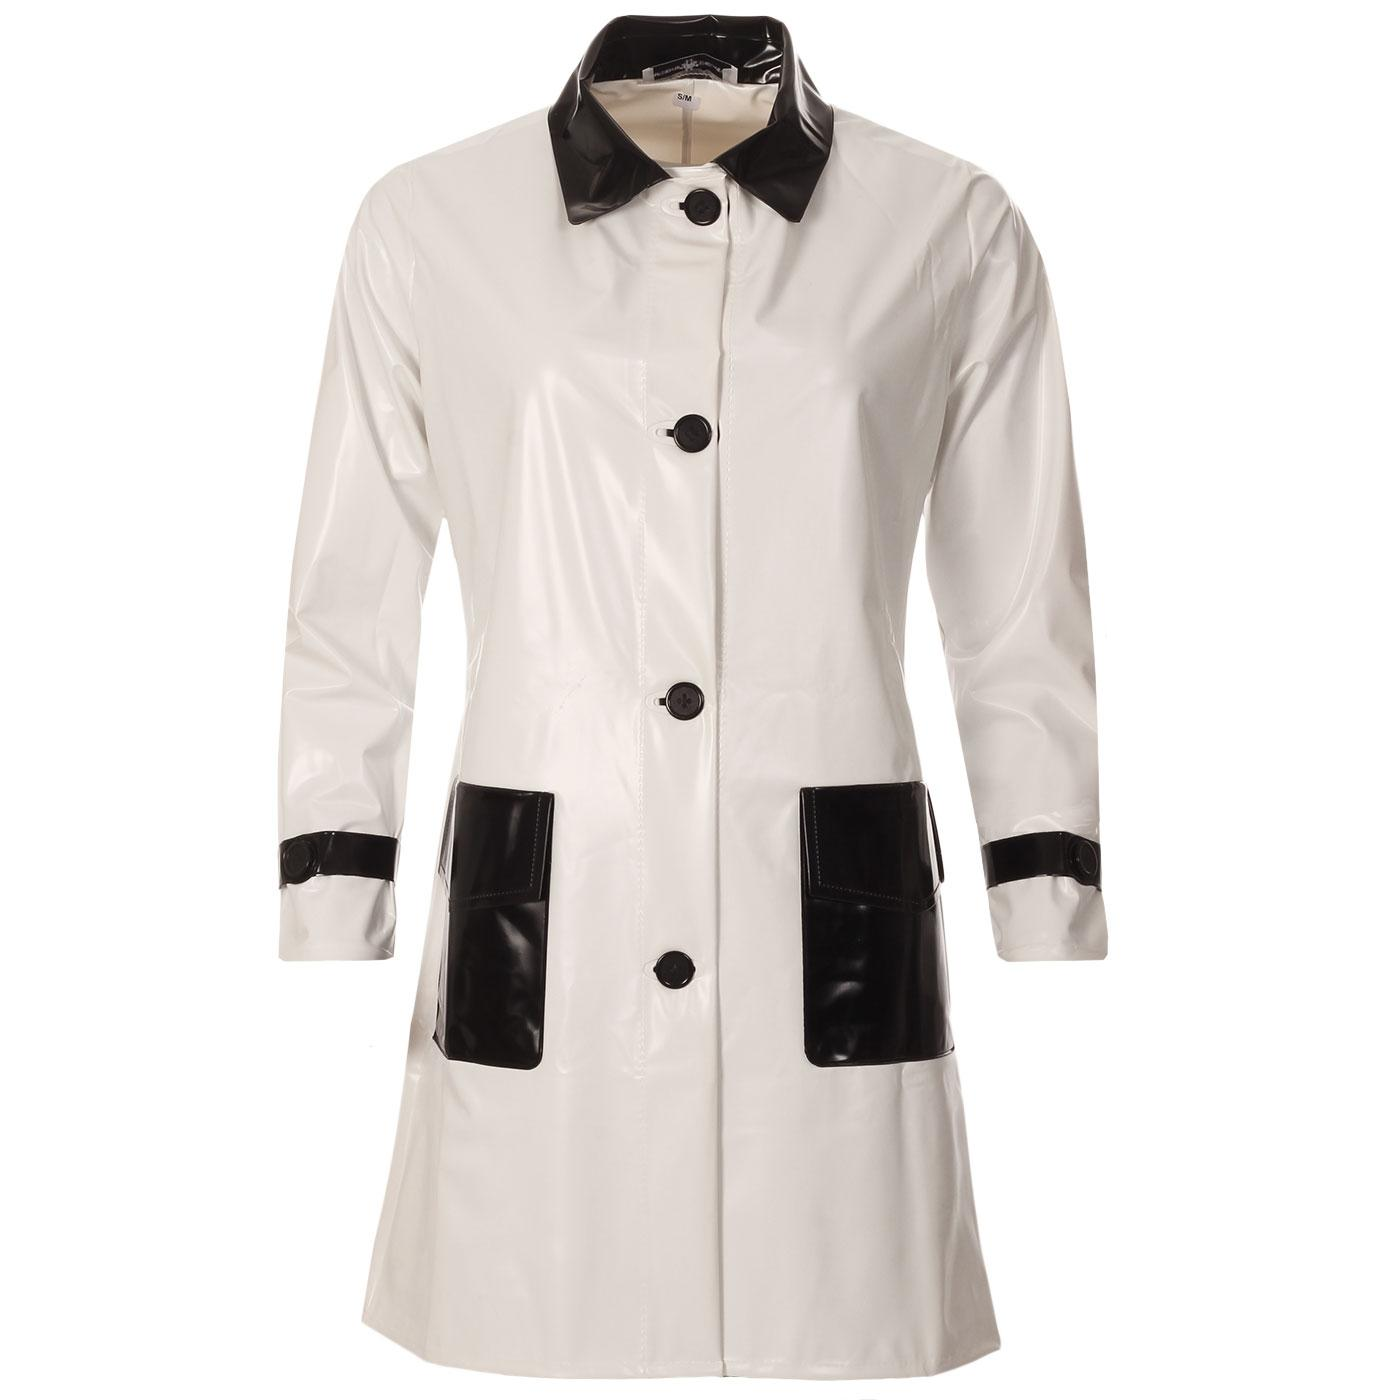 Robin MADCAP ENGLAND Mod 2 Tone PVC Raincoat (W/B)